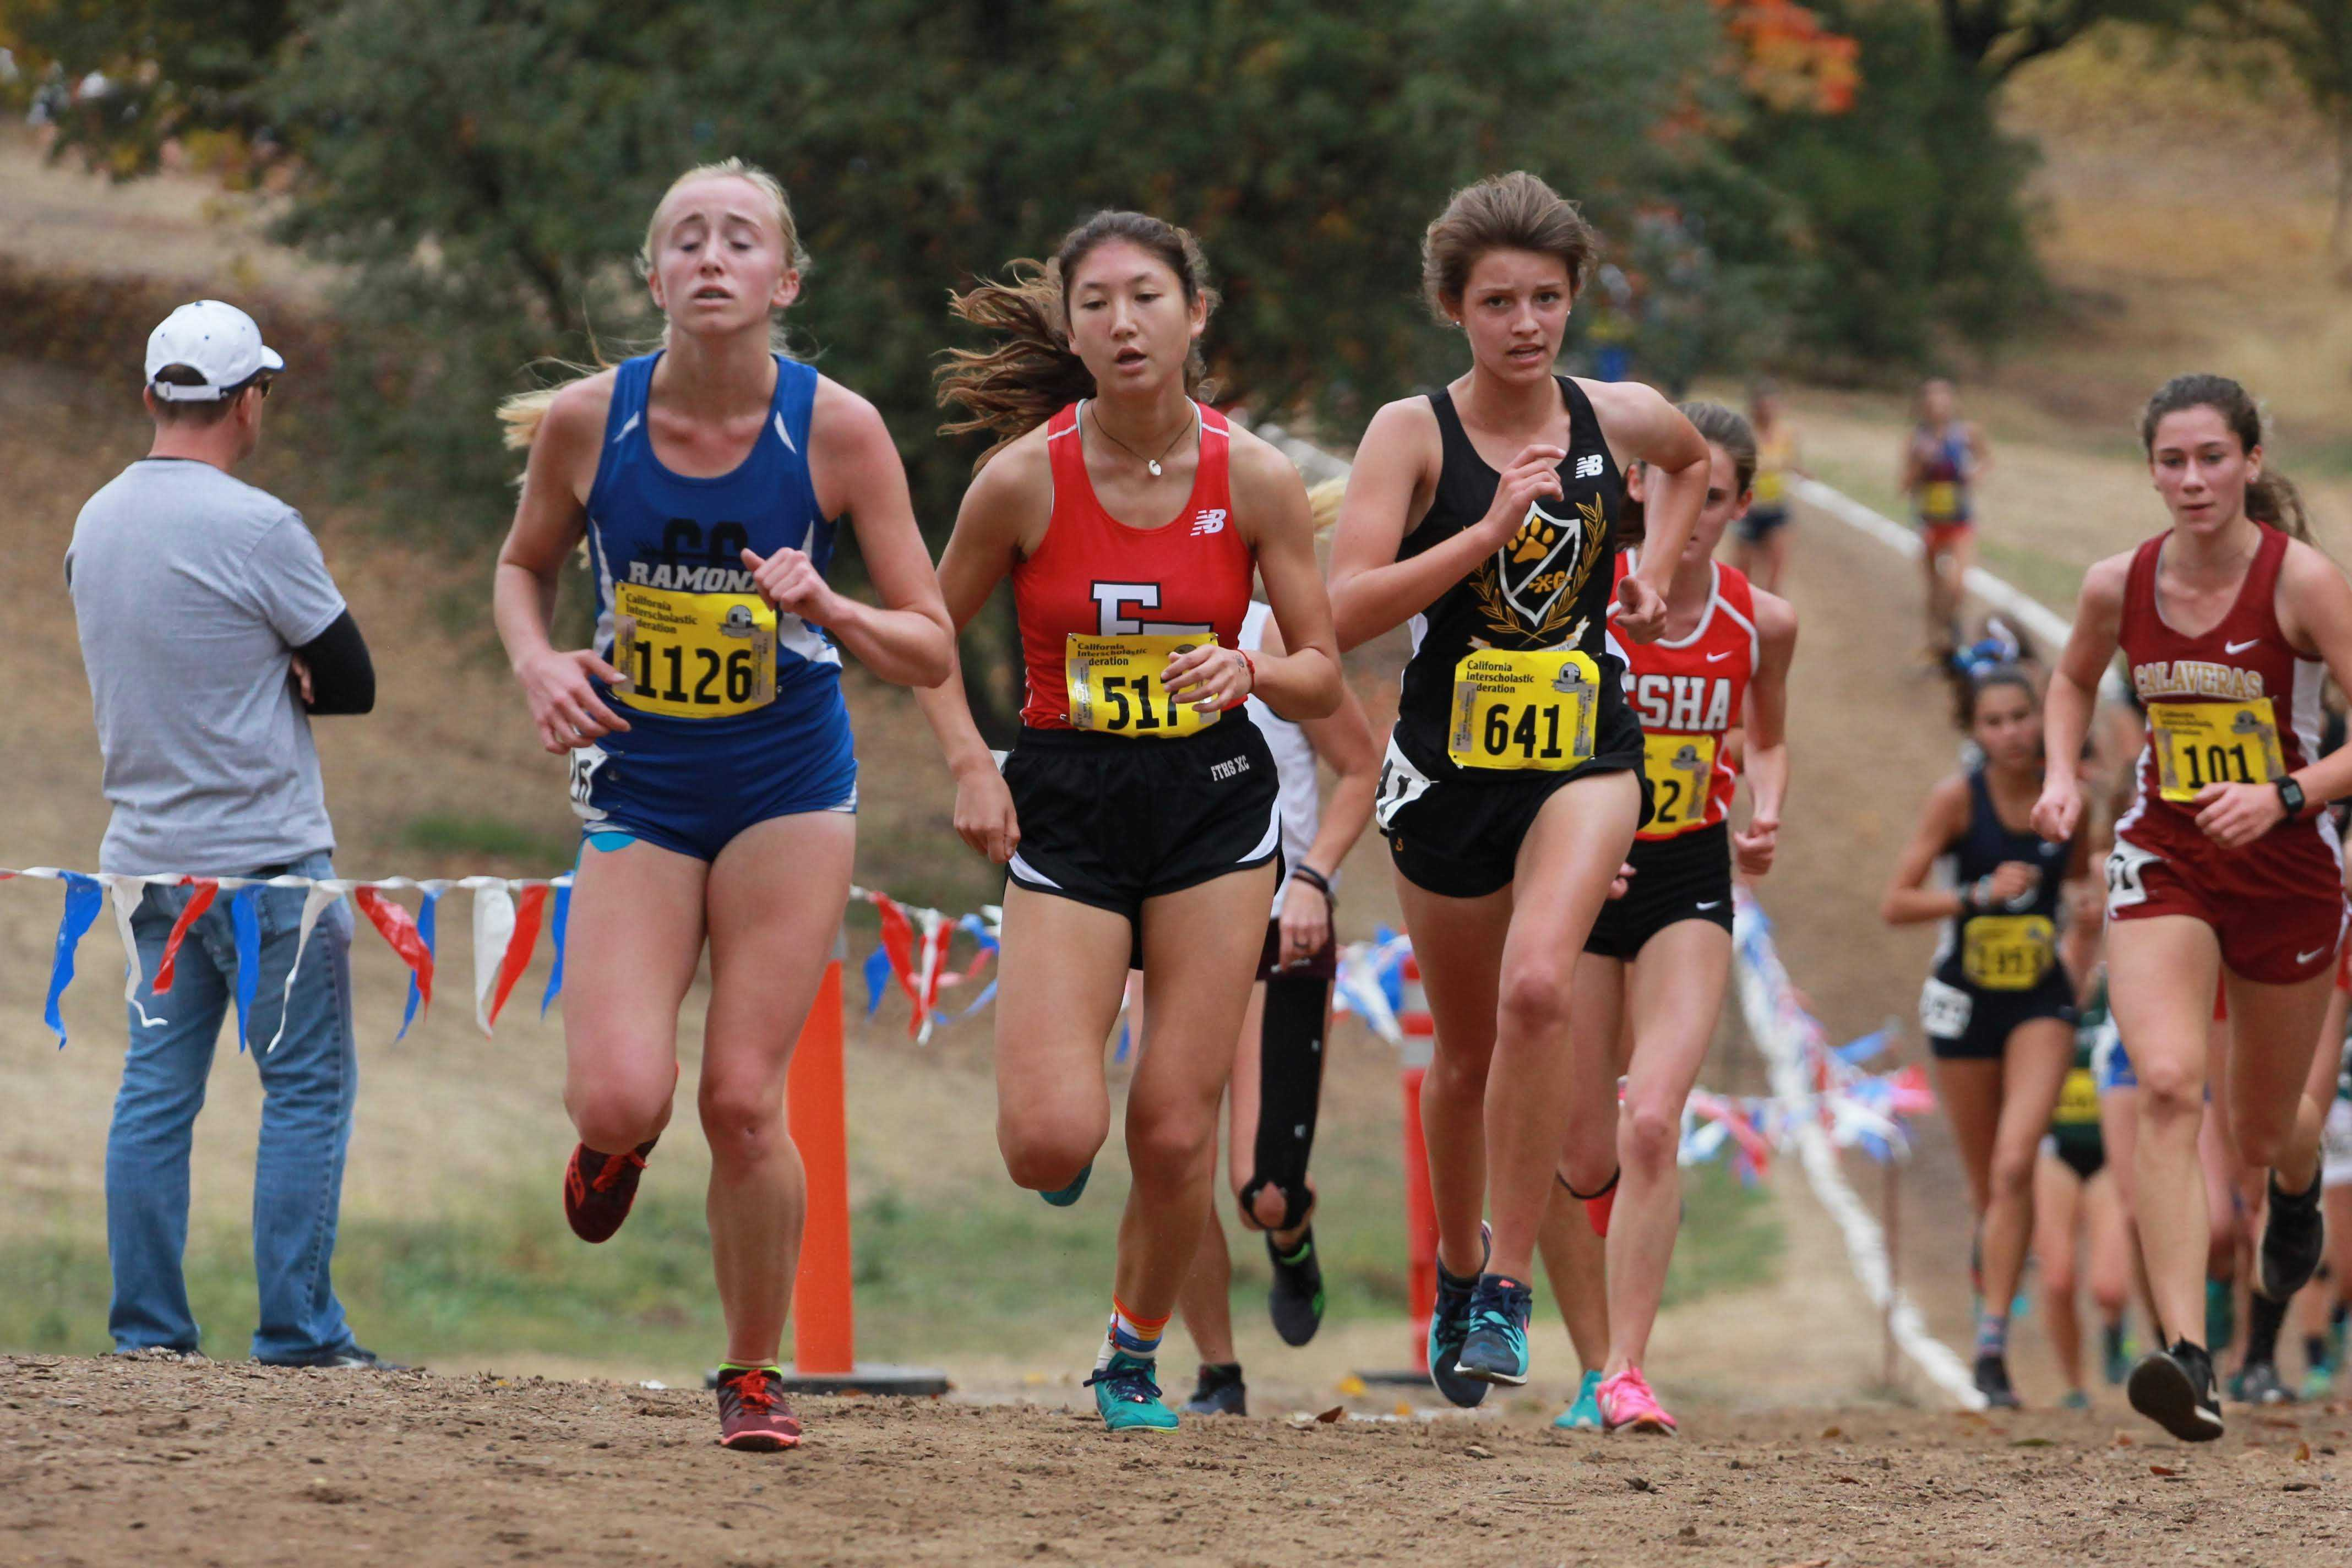 Hana Vrablik works against her teammates up towards the two-mile marker. Credit: Jocelyn Brossia / The Foothill Dragon Press